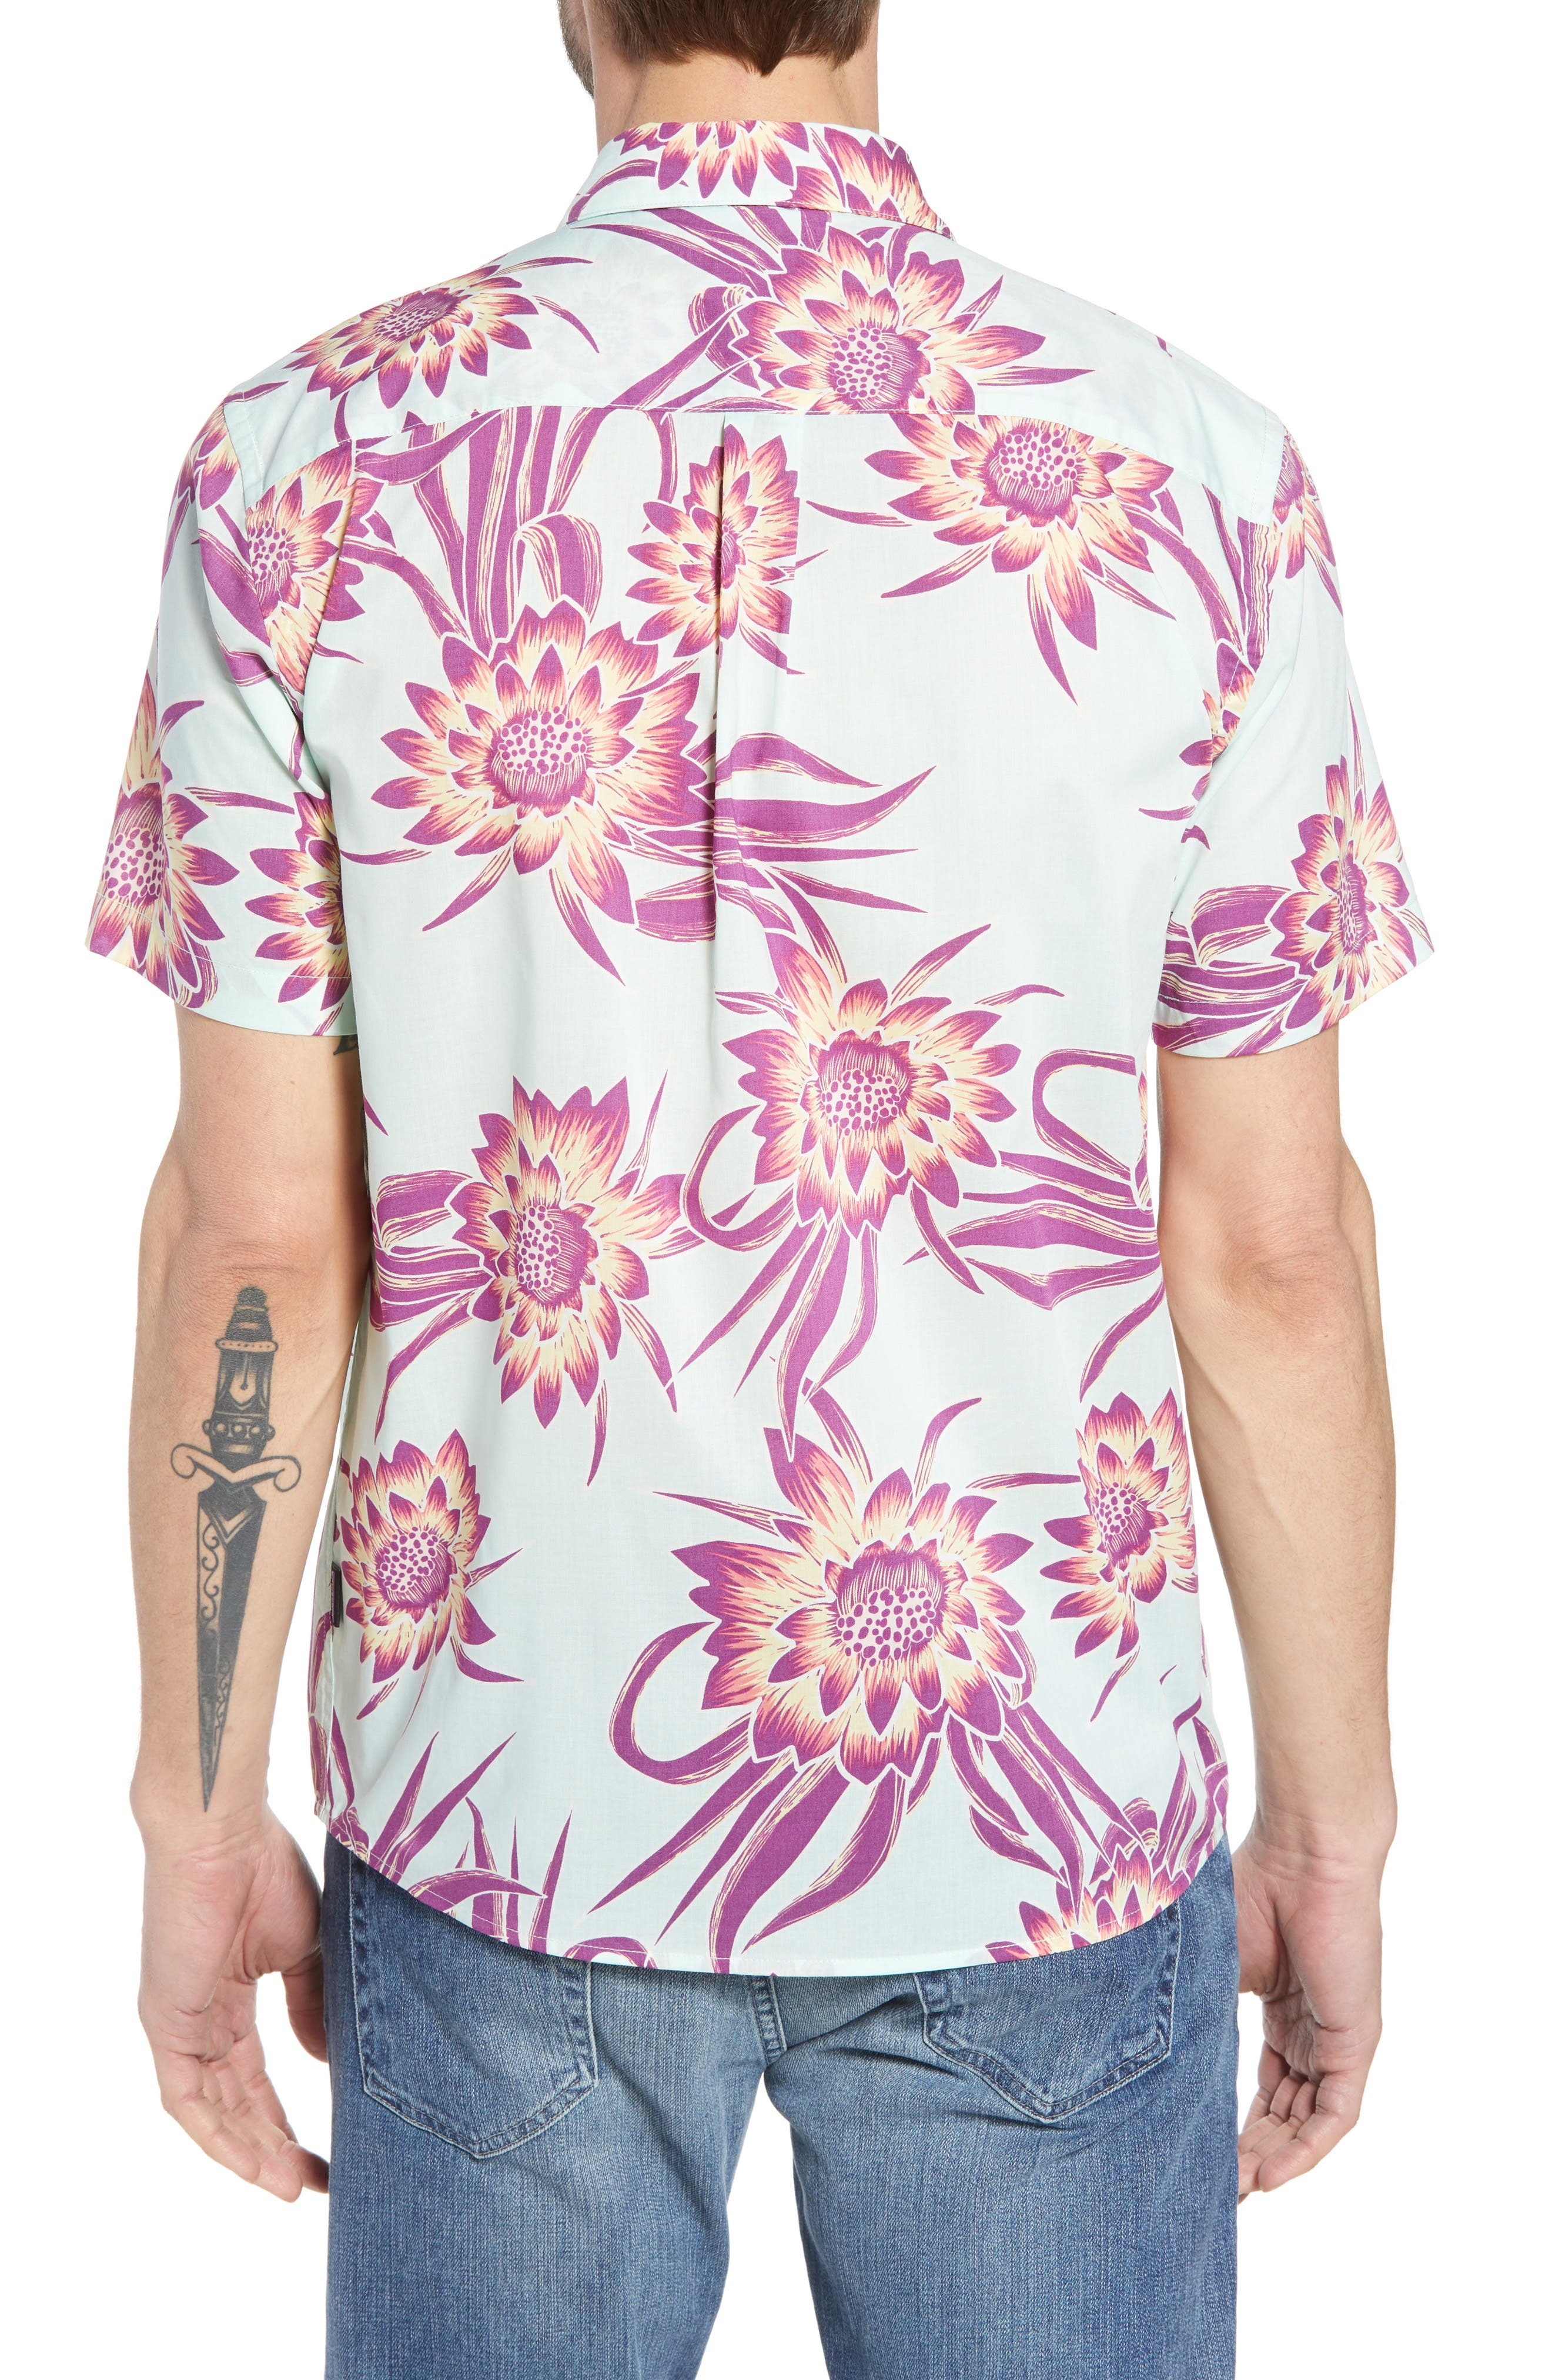 'Go To' Slim Fit Short Sleeve Sport Shirt,                             Alternate thumbnail 3, color,                             Cereus Flower/ Lite Bend Blue